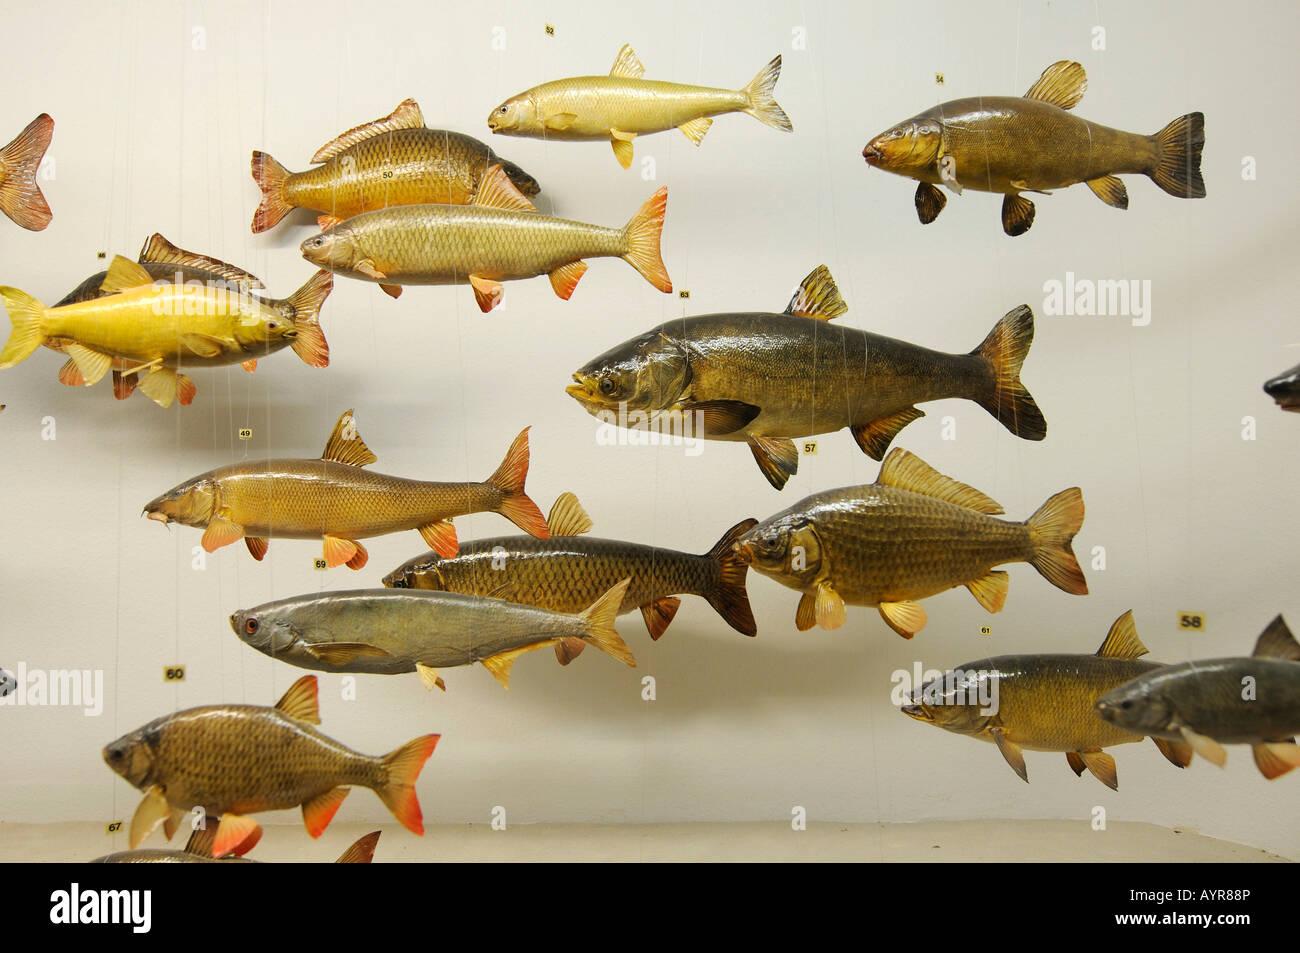 Fish models, Deutsches Jagd- und Fischereimuseum (German Hunting and Fishing Museum), Munich, Bavaria, Germany - Stock Image